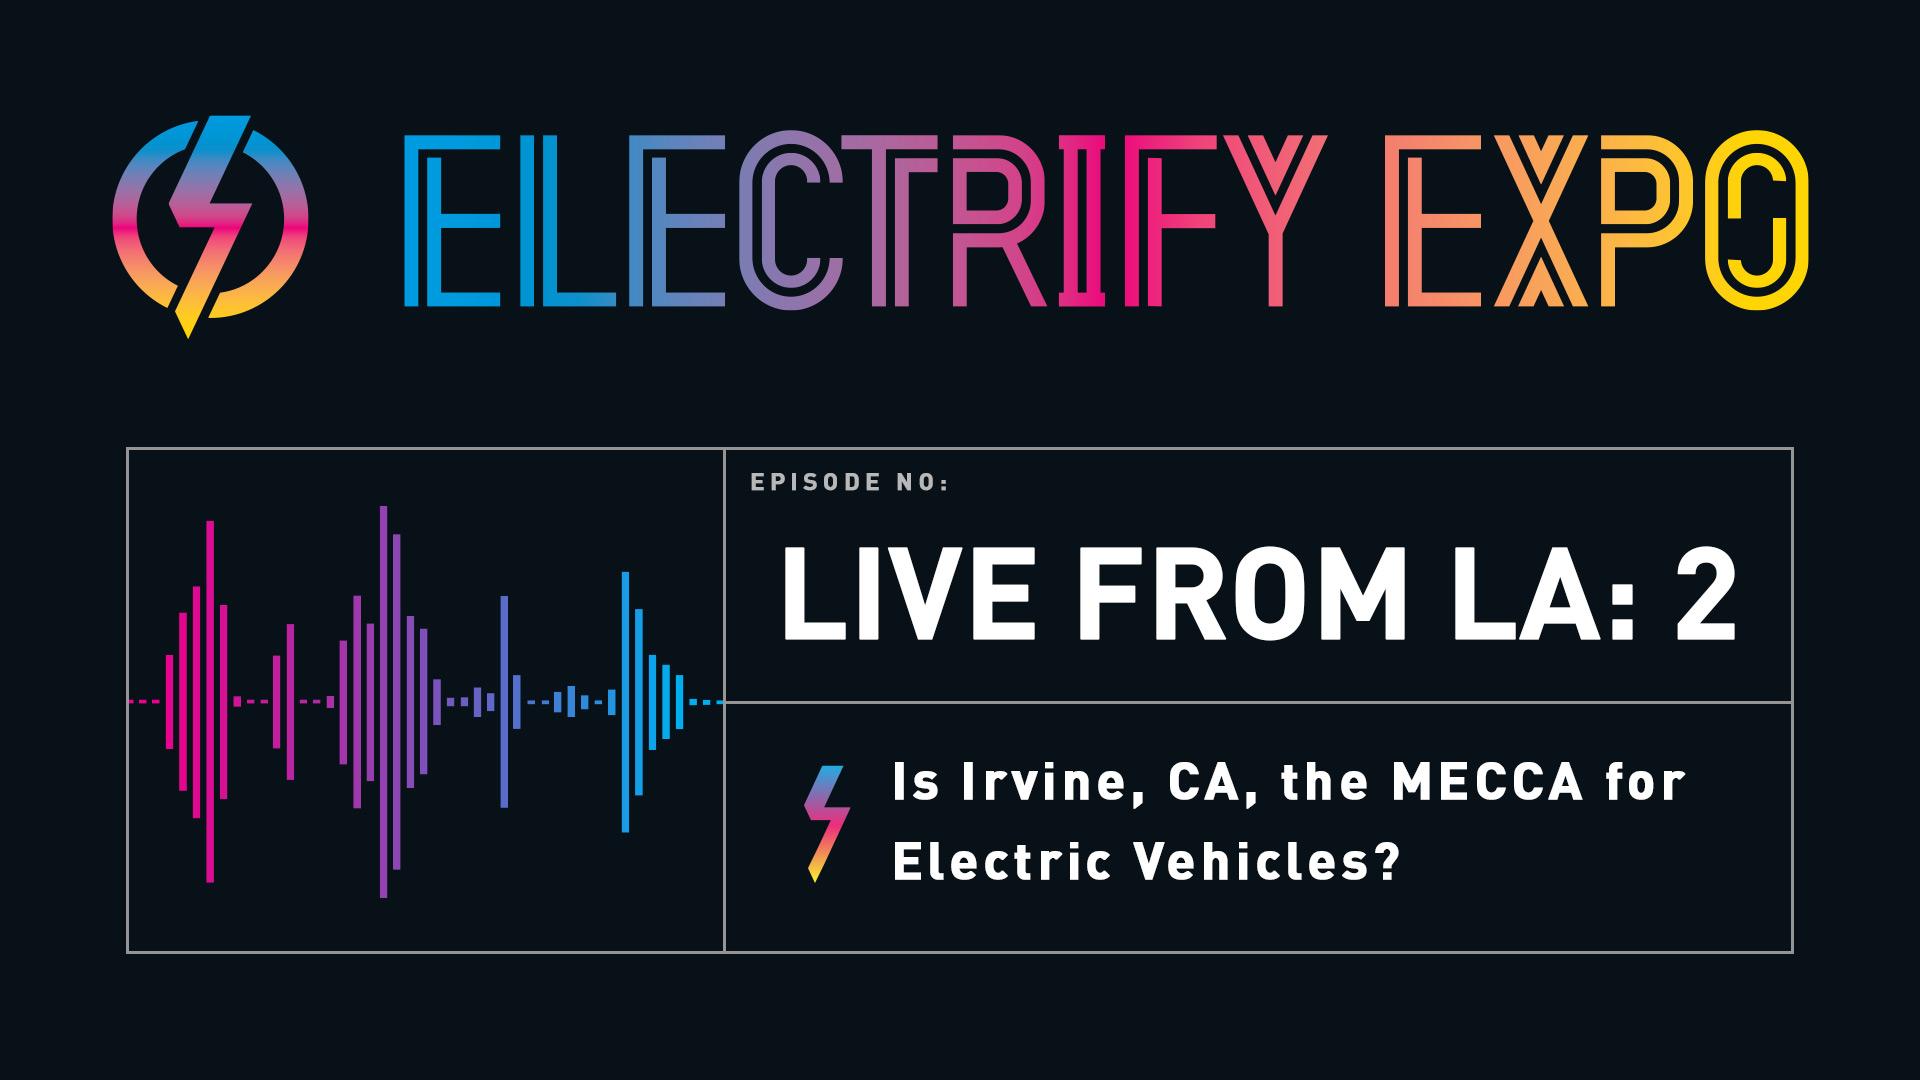 Electrify Expo Podcast image